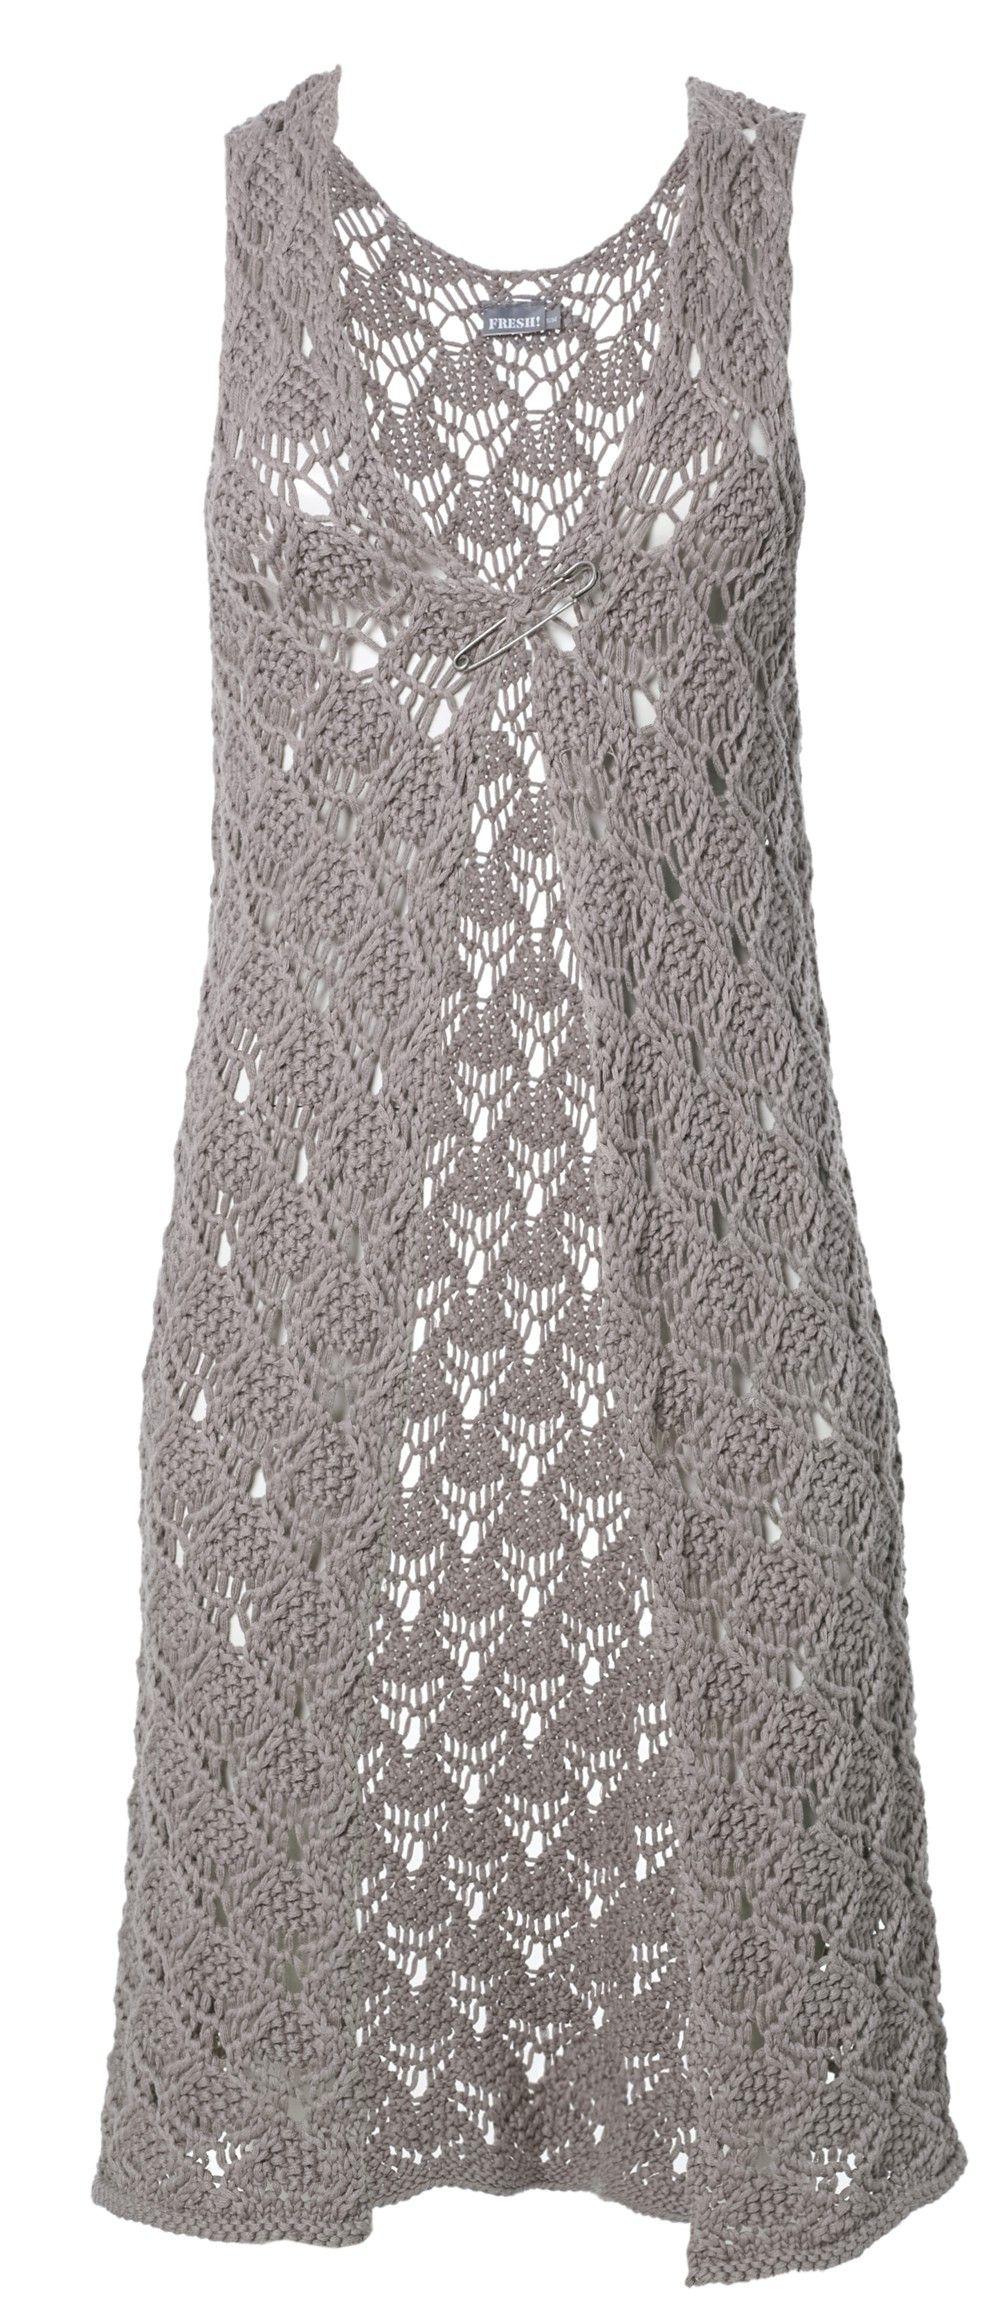 Angie Gehaakt Mouwloos Vest In Bohemian Style Draag Je Heel